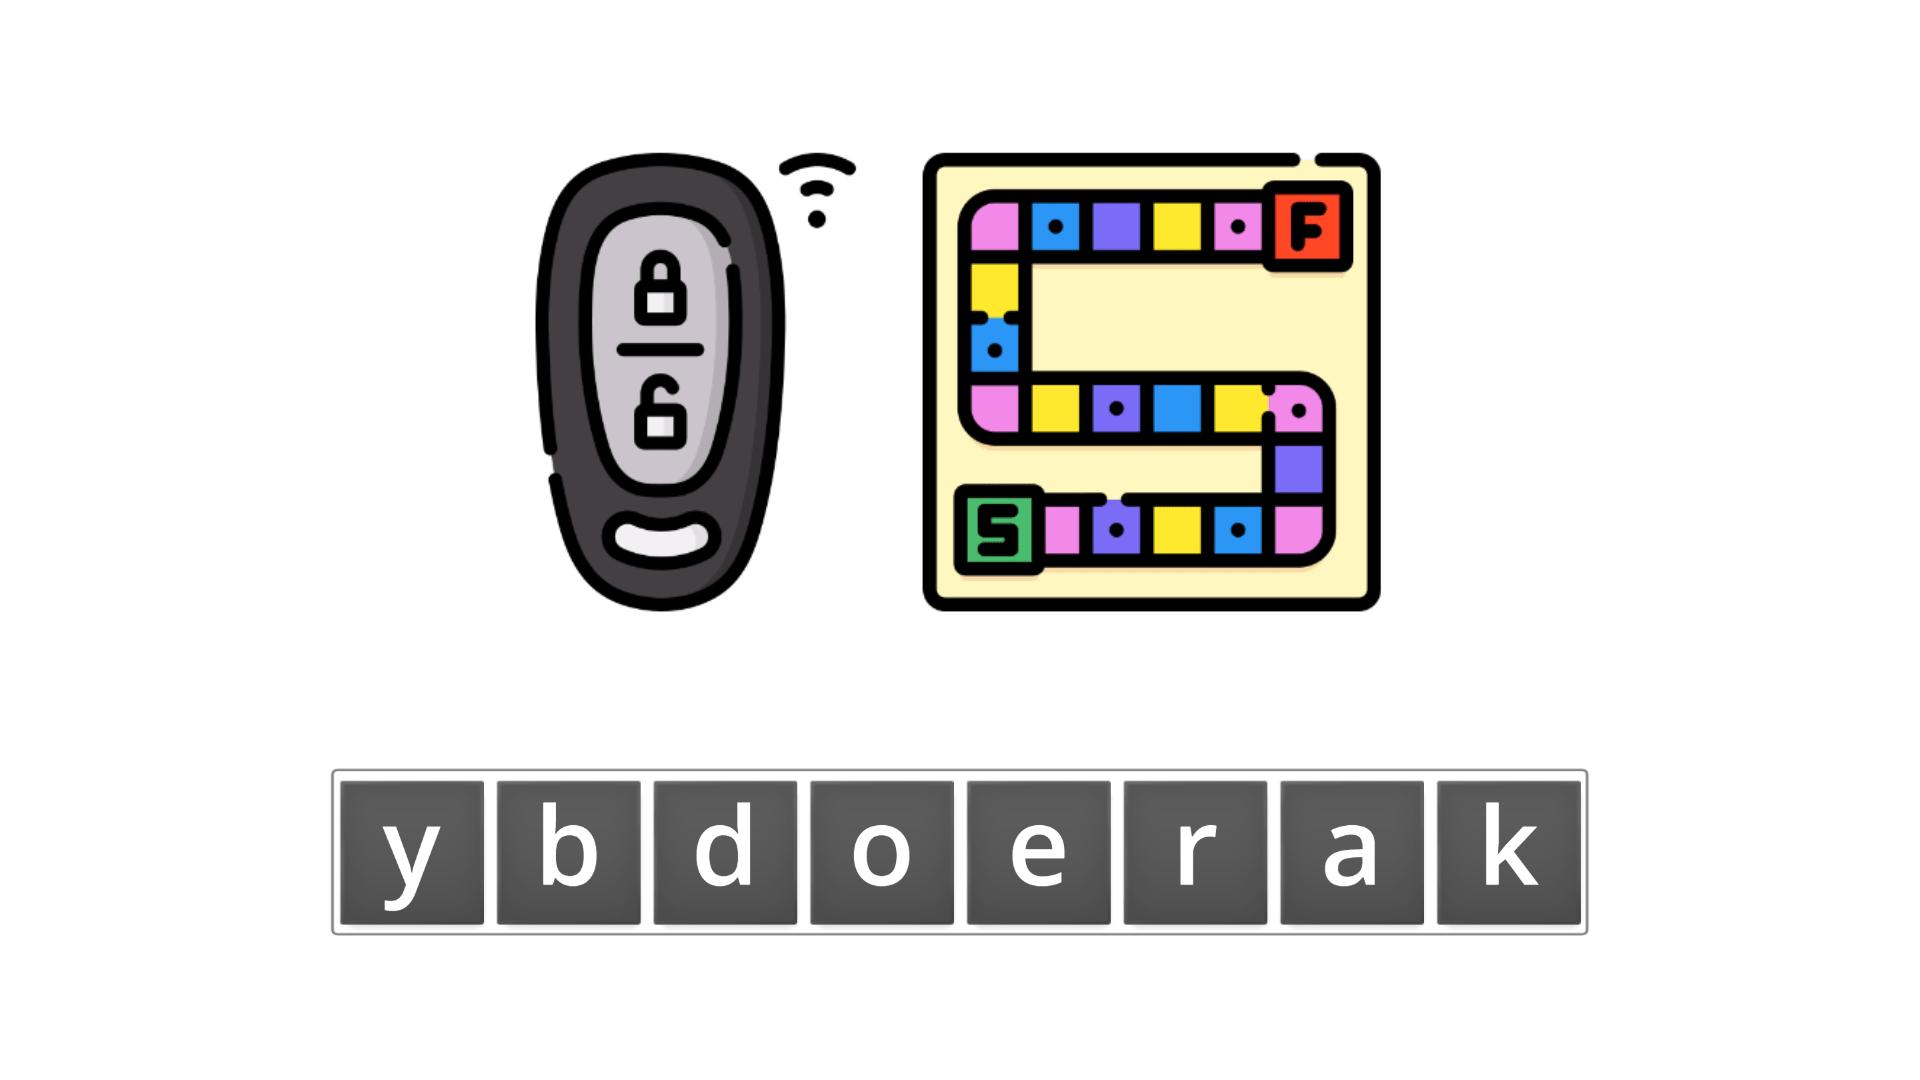 esl resources - flashcards - compound nouns  - unscramble - keyboard